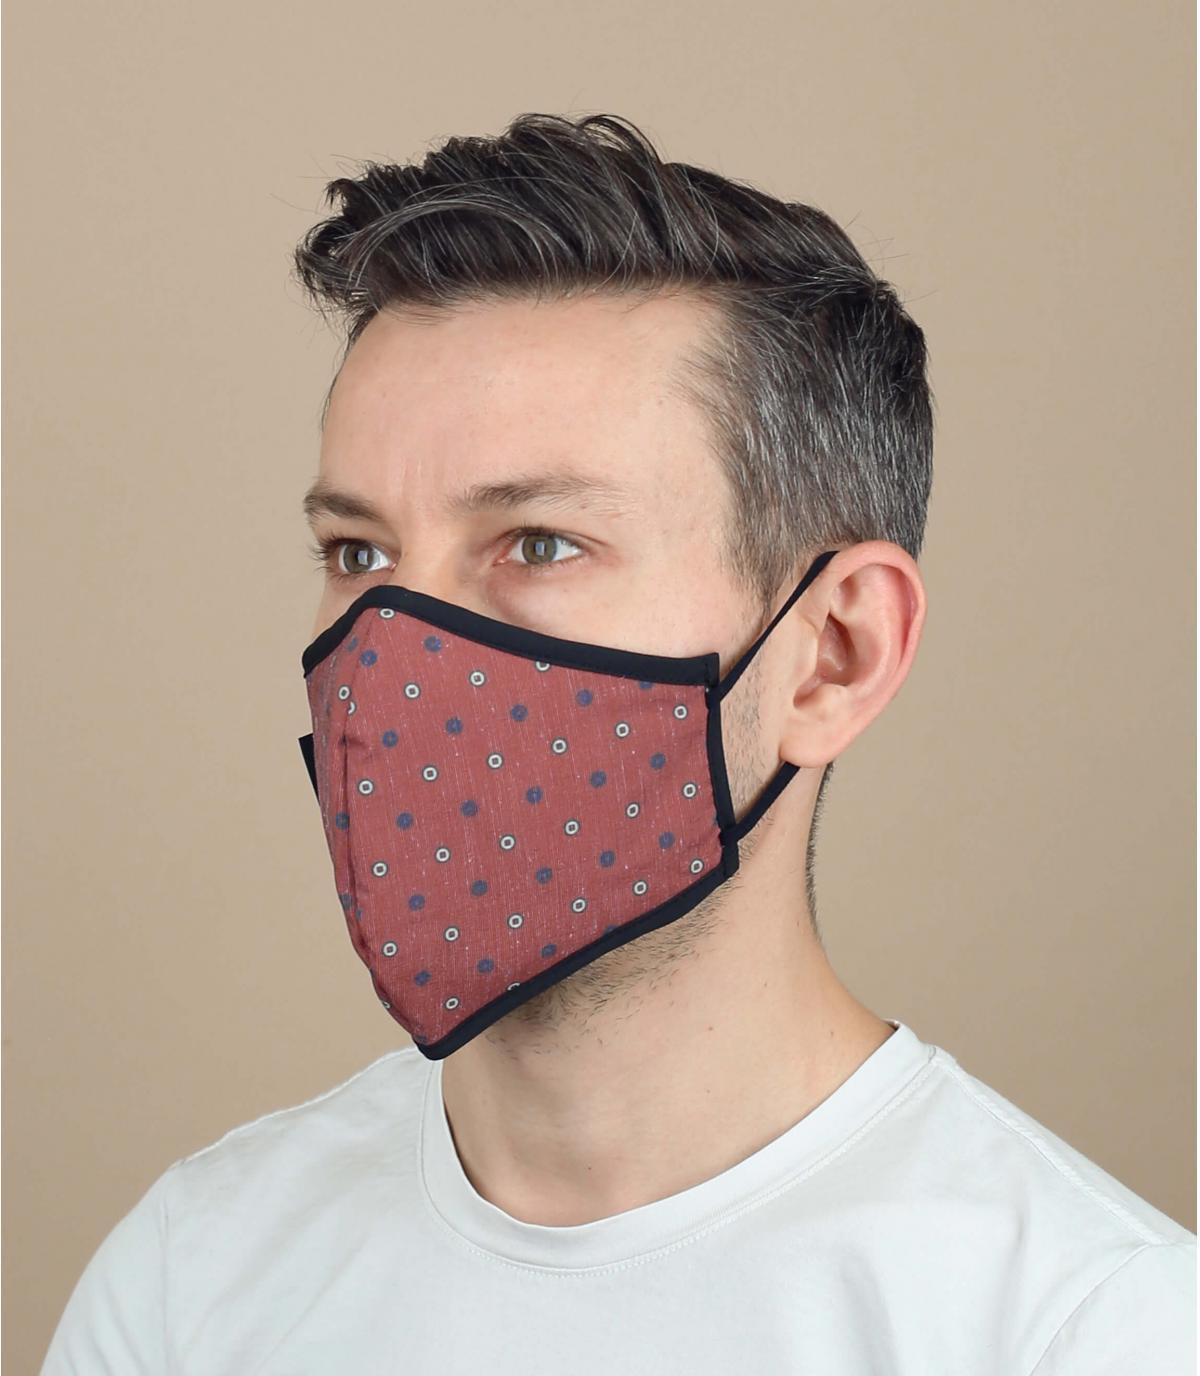 máscara Coronavirus puntos